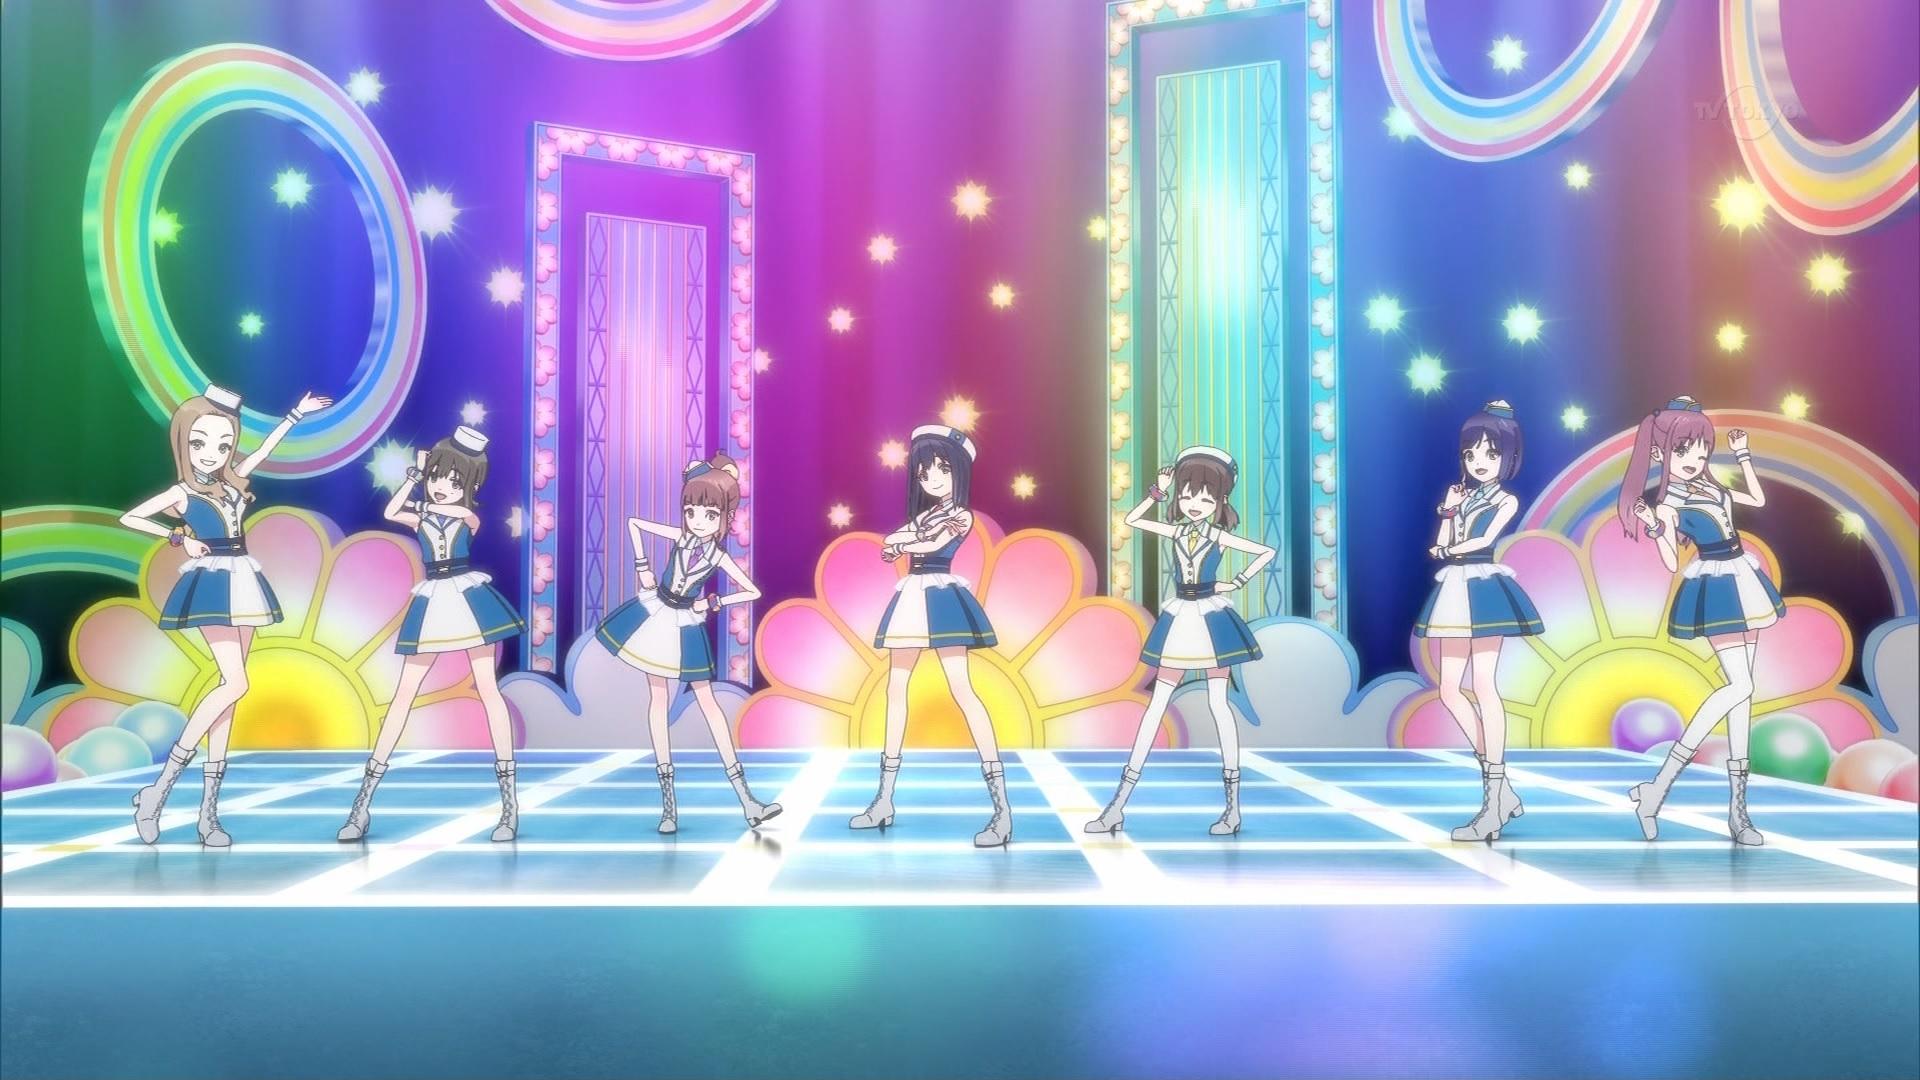 7 Girls Warのライブ